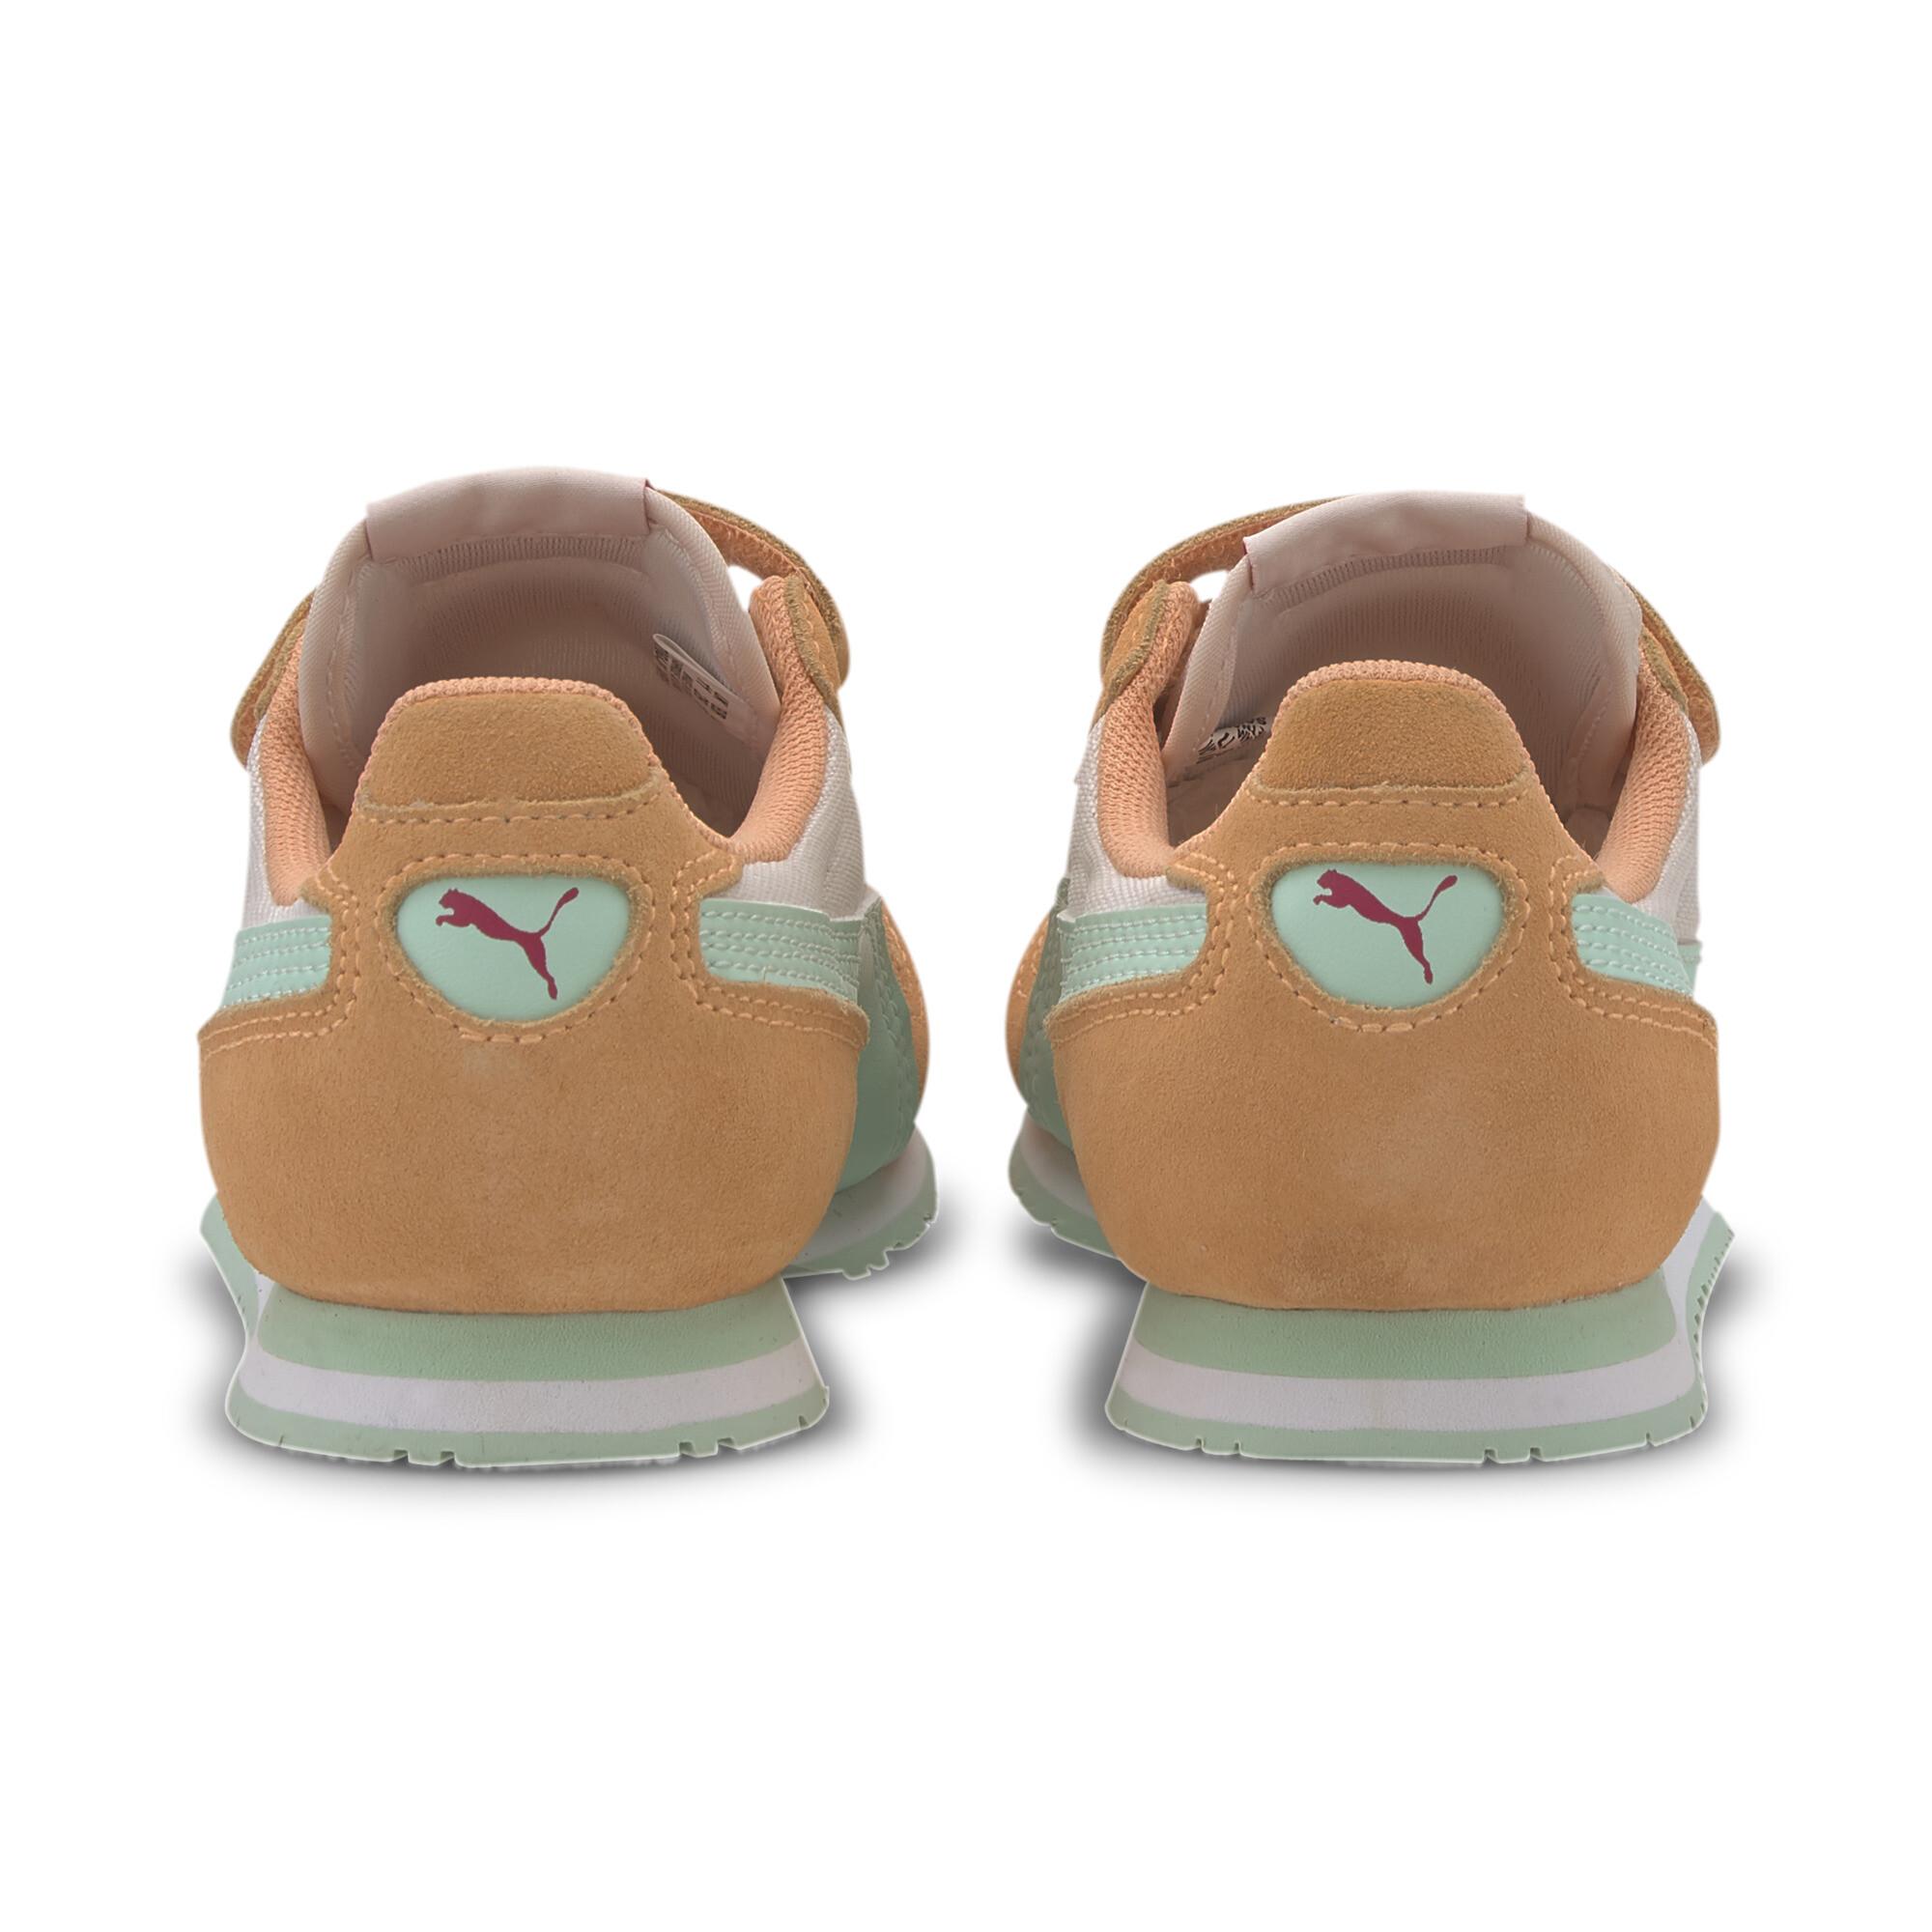 PUMA-Cabana-Racer-Little-Kids-039-Shoes-Kids-Shoe-Kids thumbnail 20